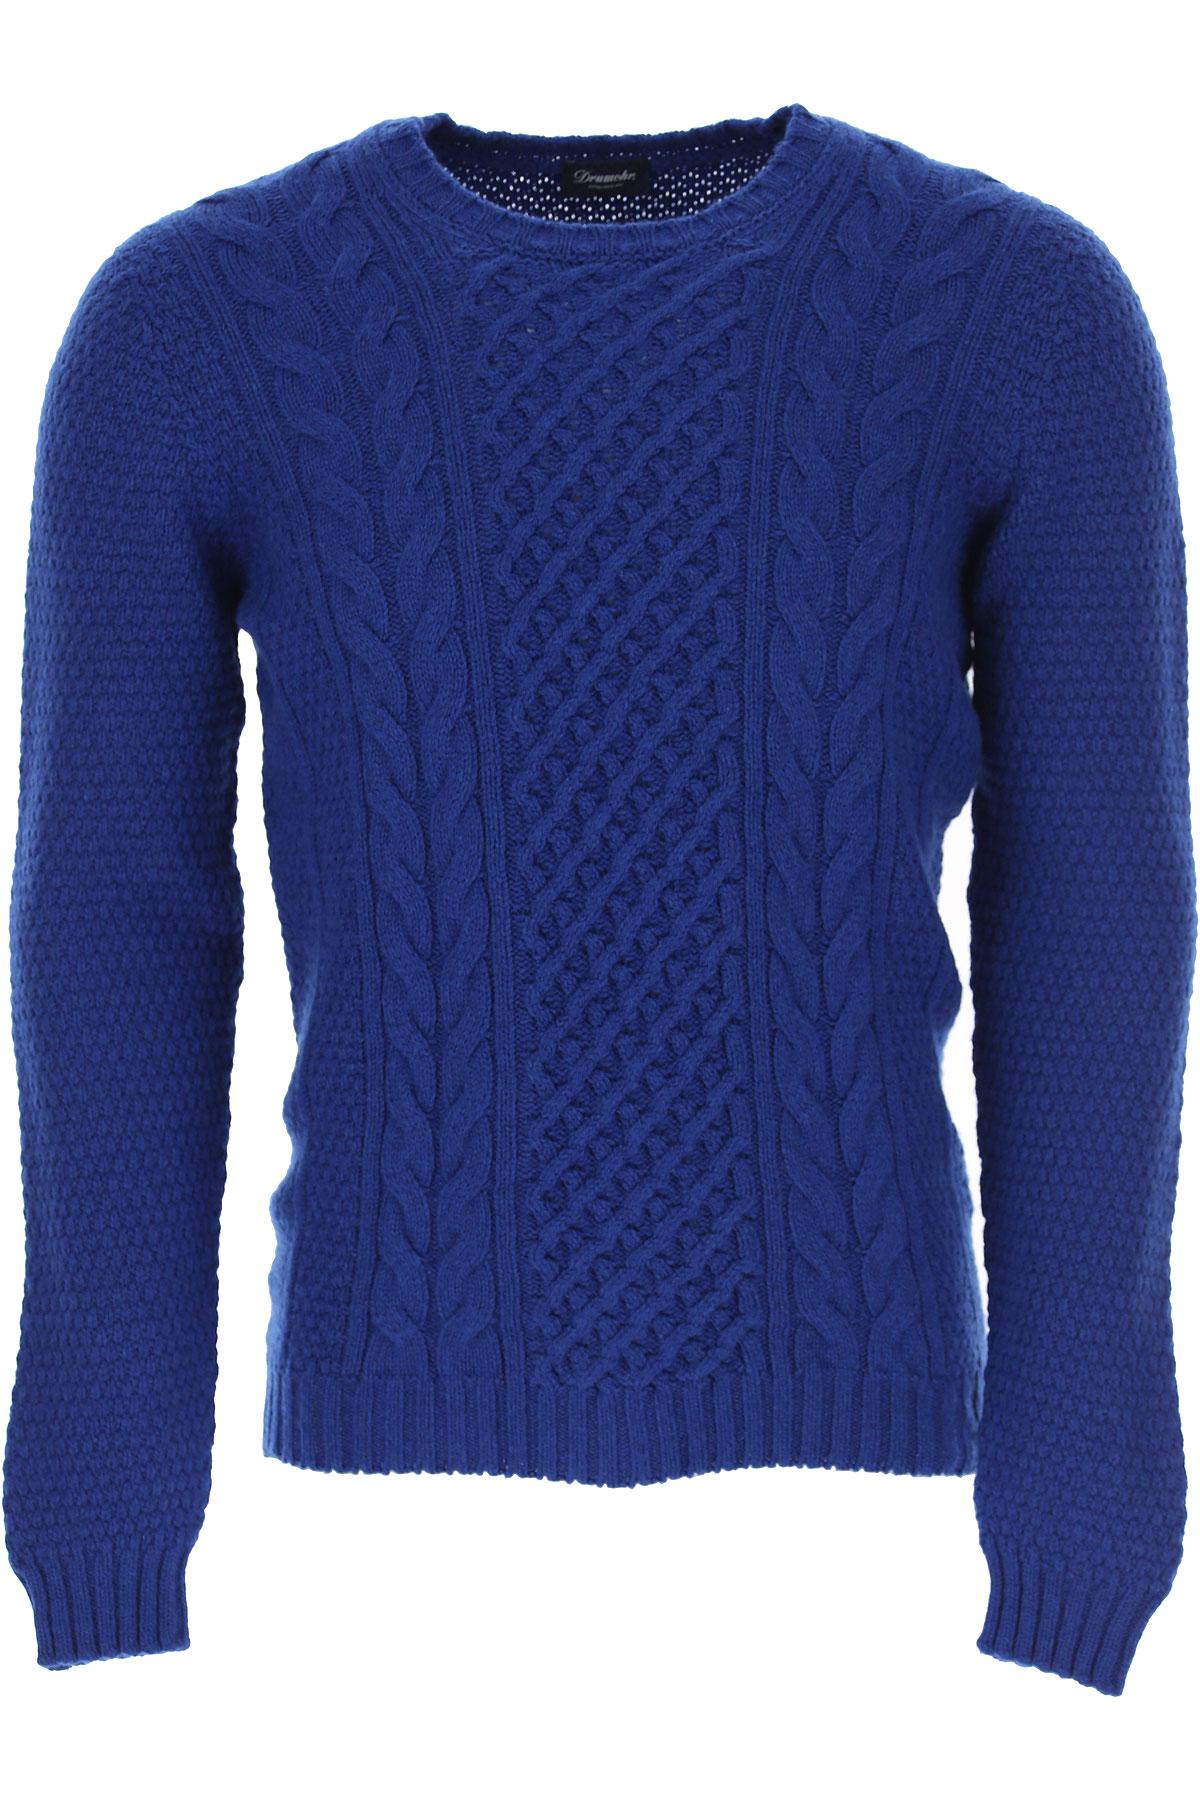 Drumohr Sweater for Men Jumper On Sale, Bluette, Lambswool, 2019, XL XXL